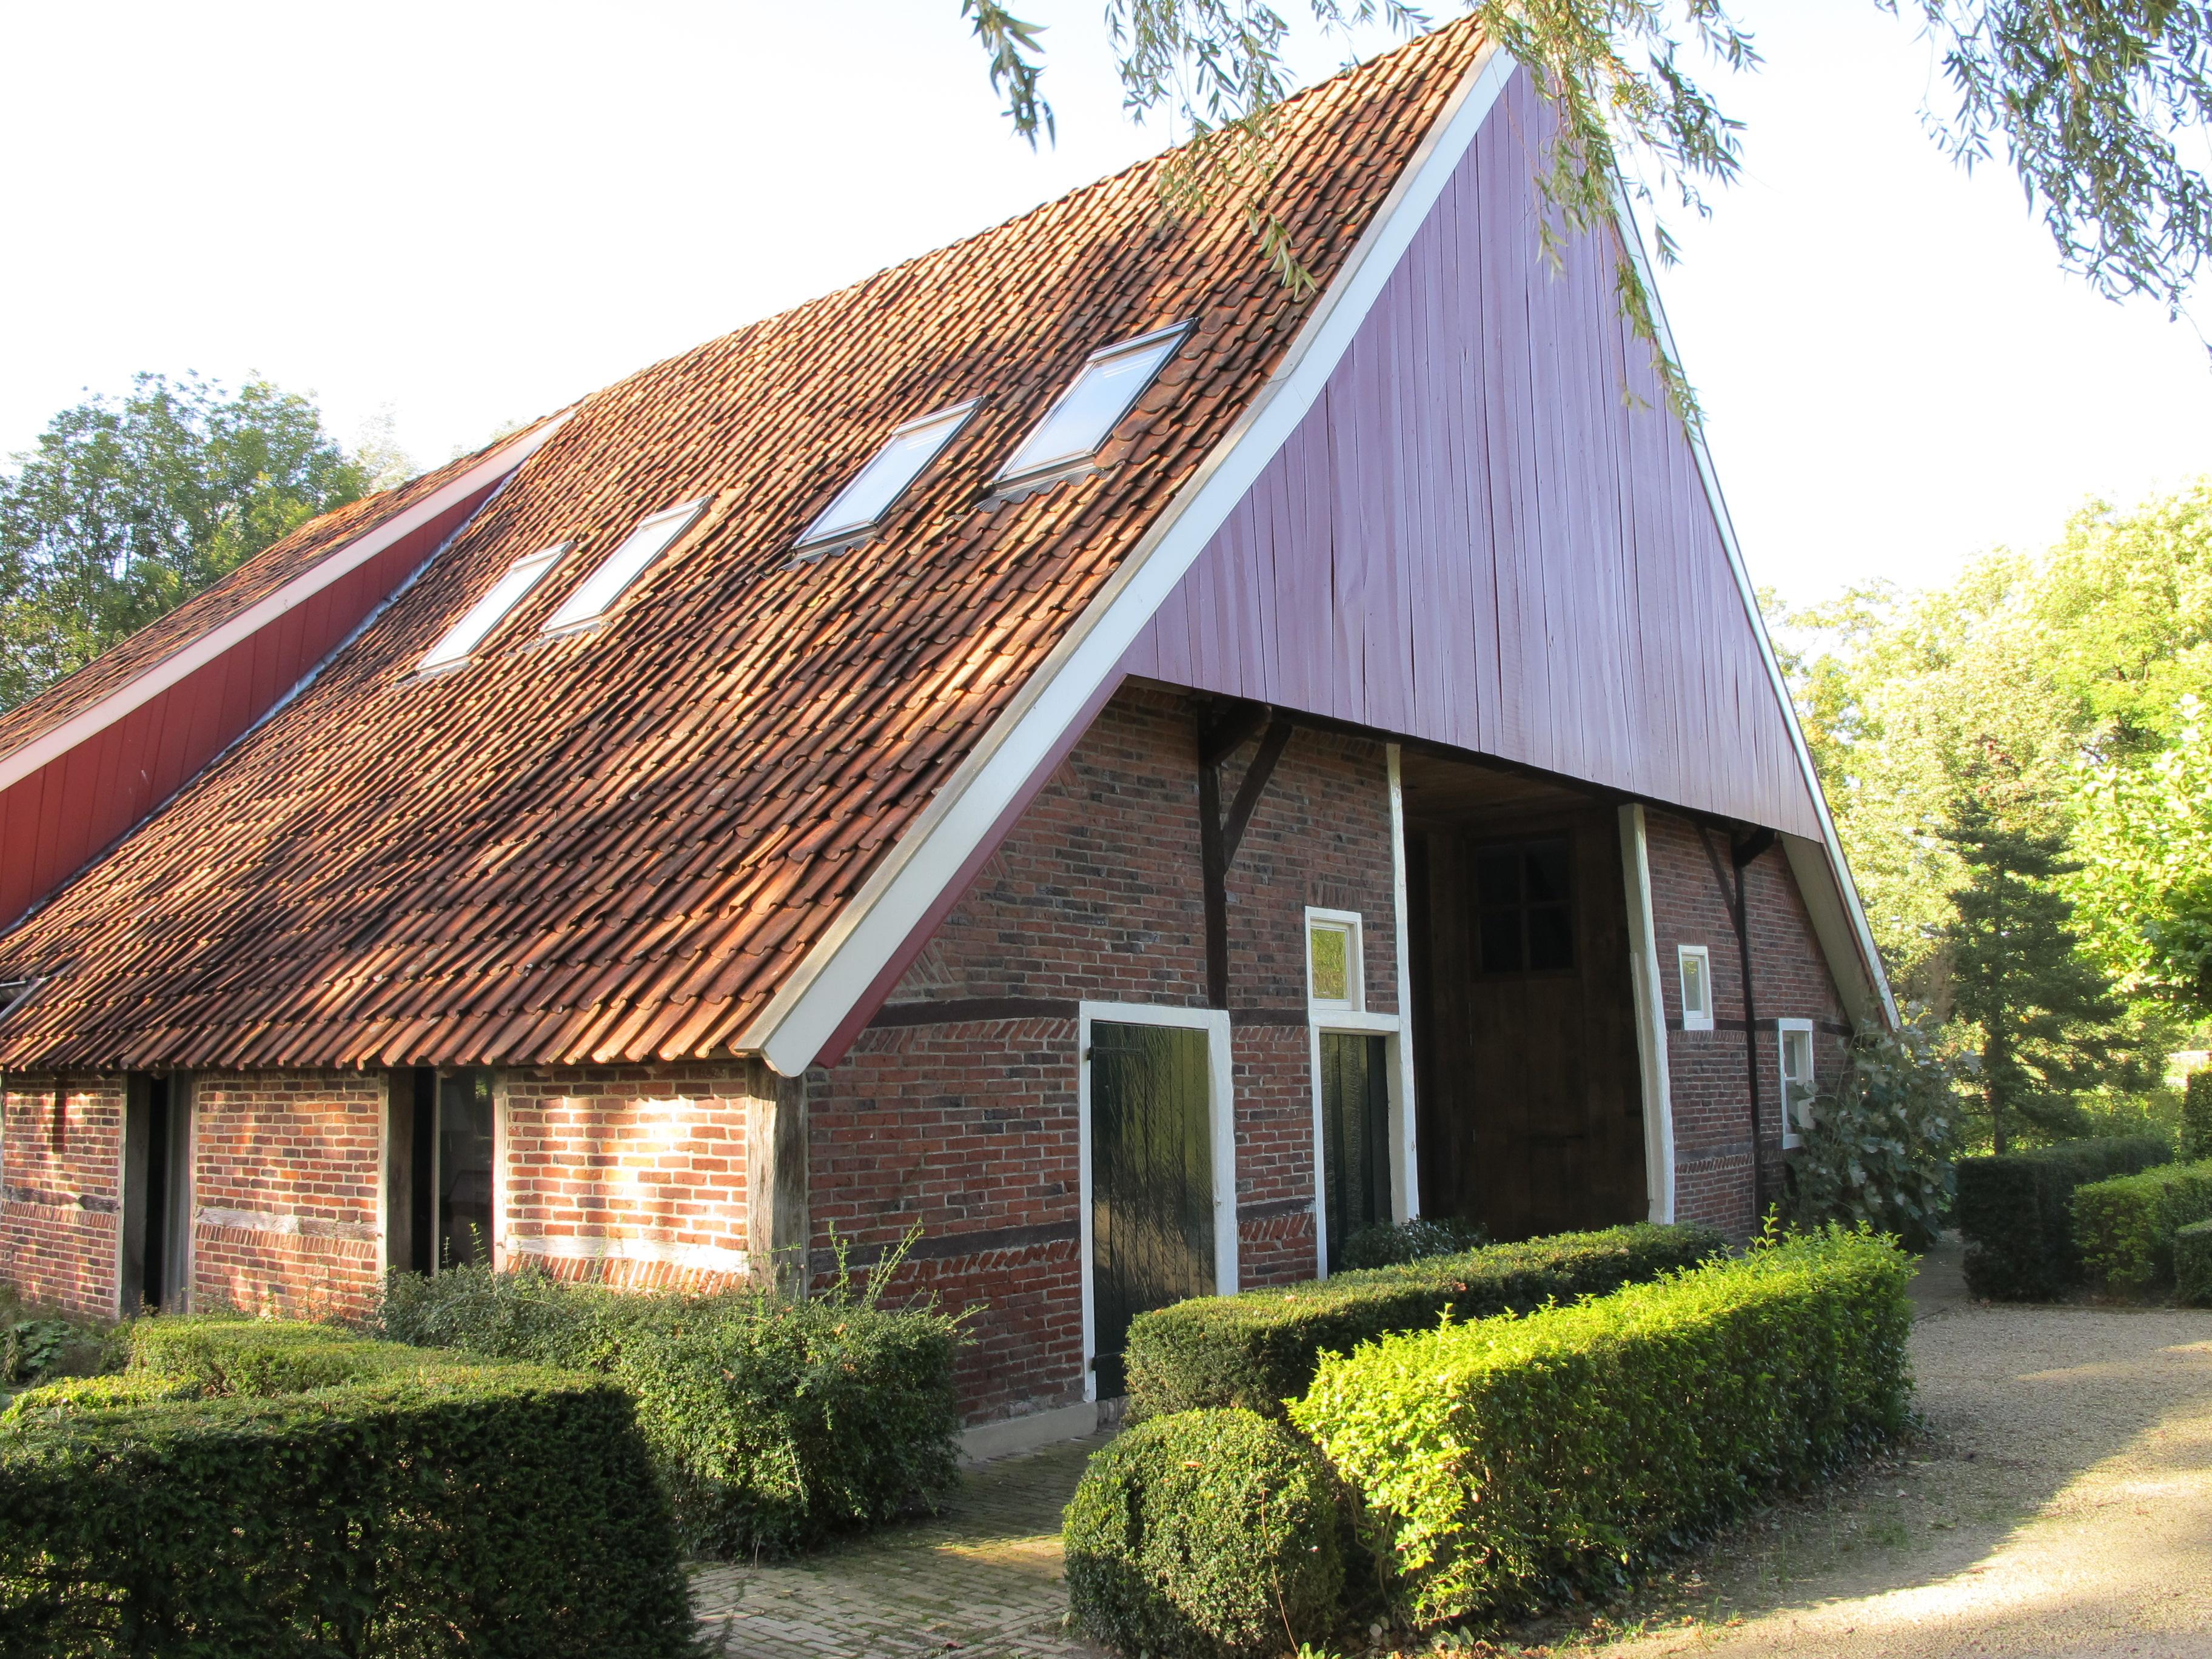 De Oude Boerderij : Oude boerderij in winterswijk kotten monument rijksmonumenten